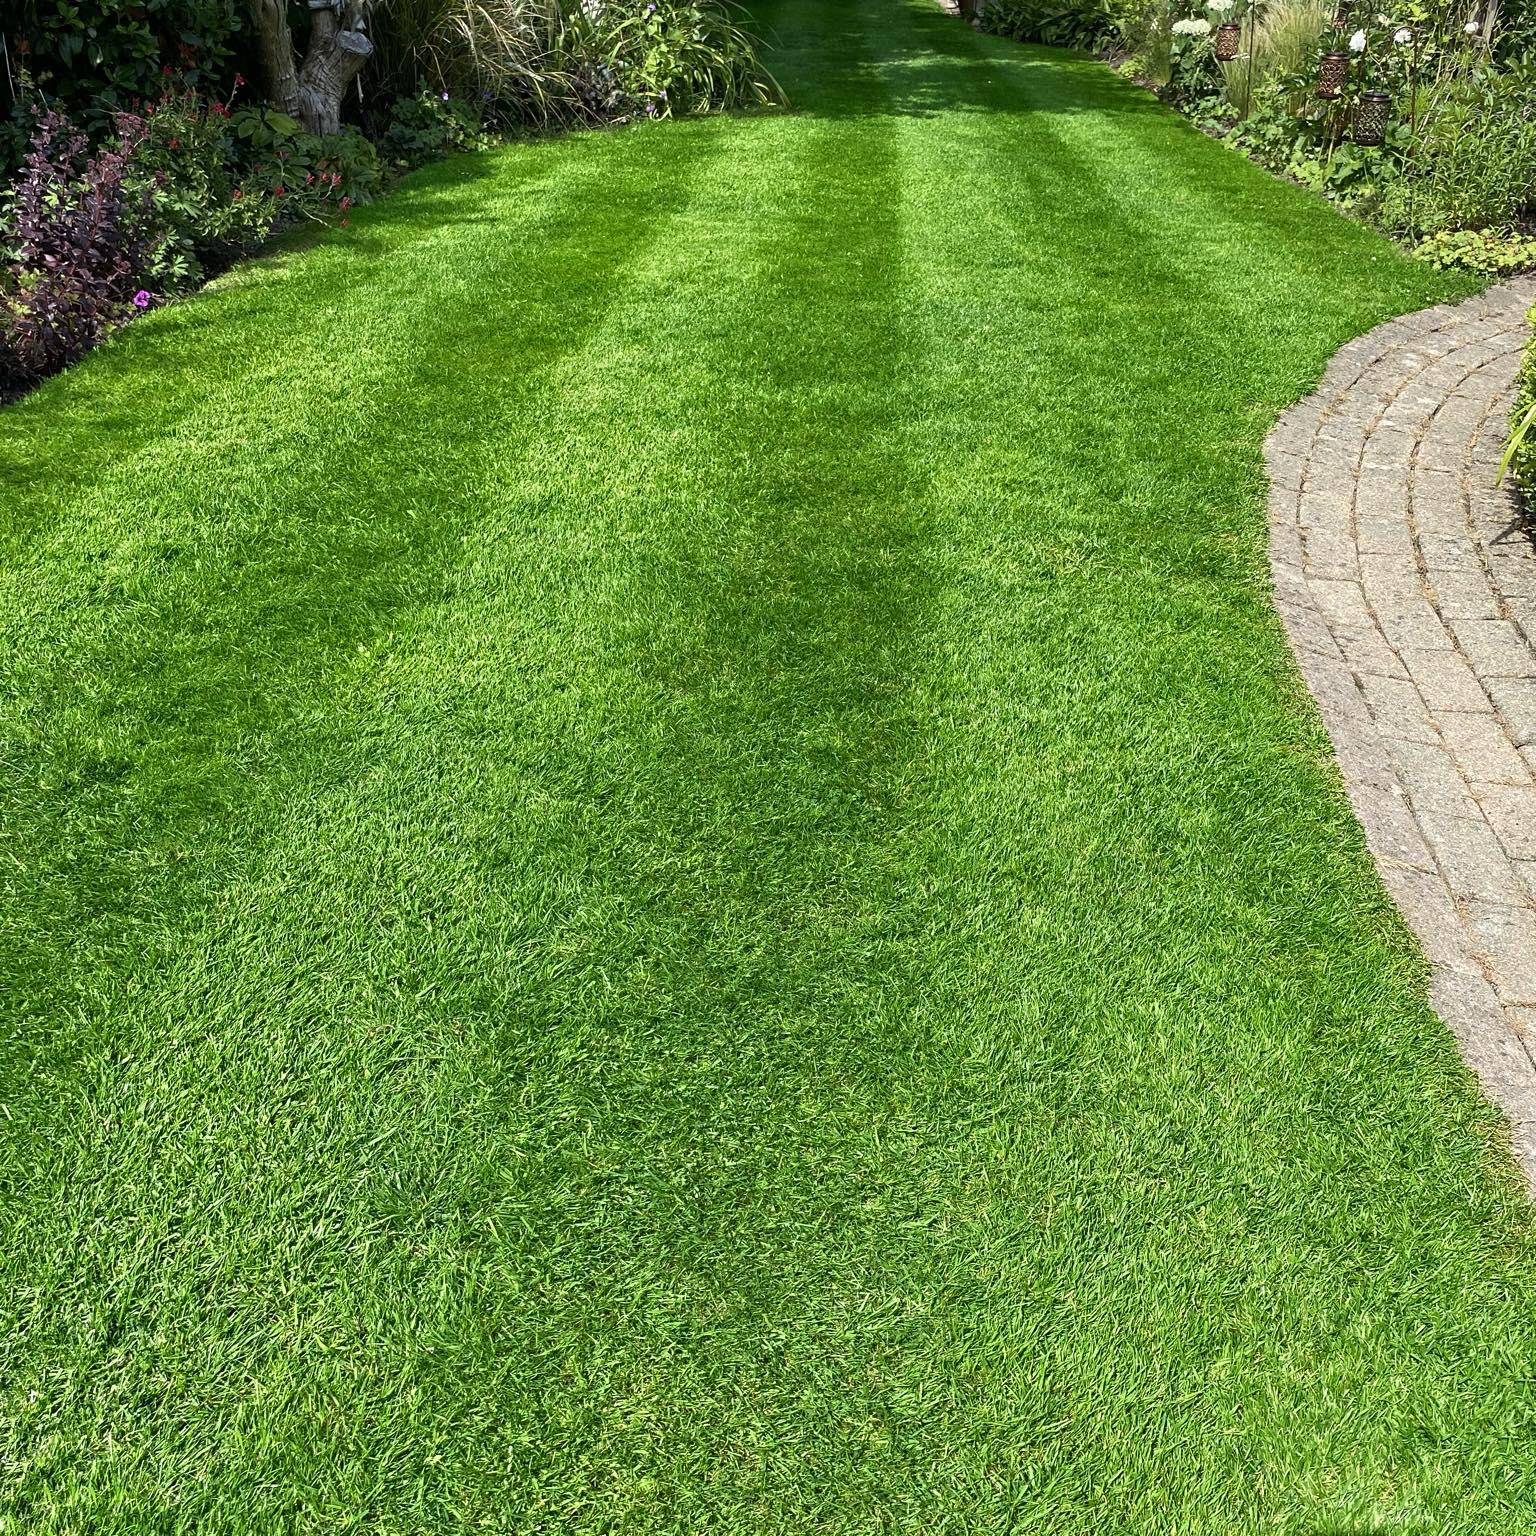 lush green lawn after lawn fertiliser treatment